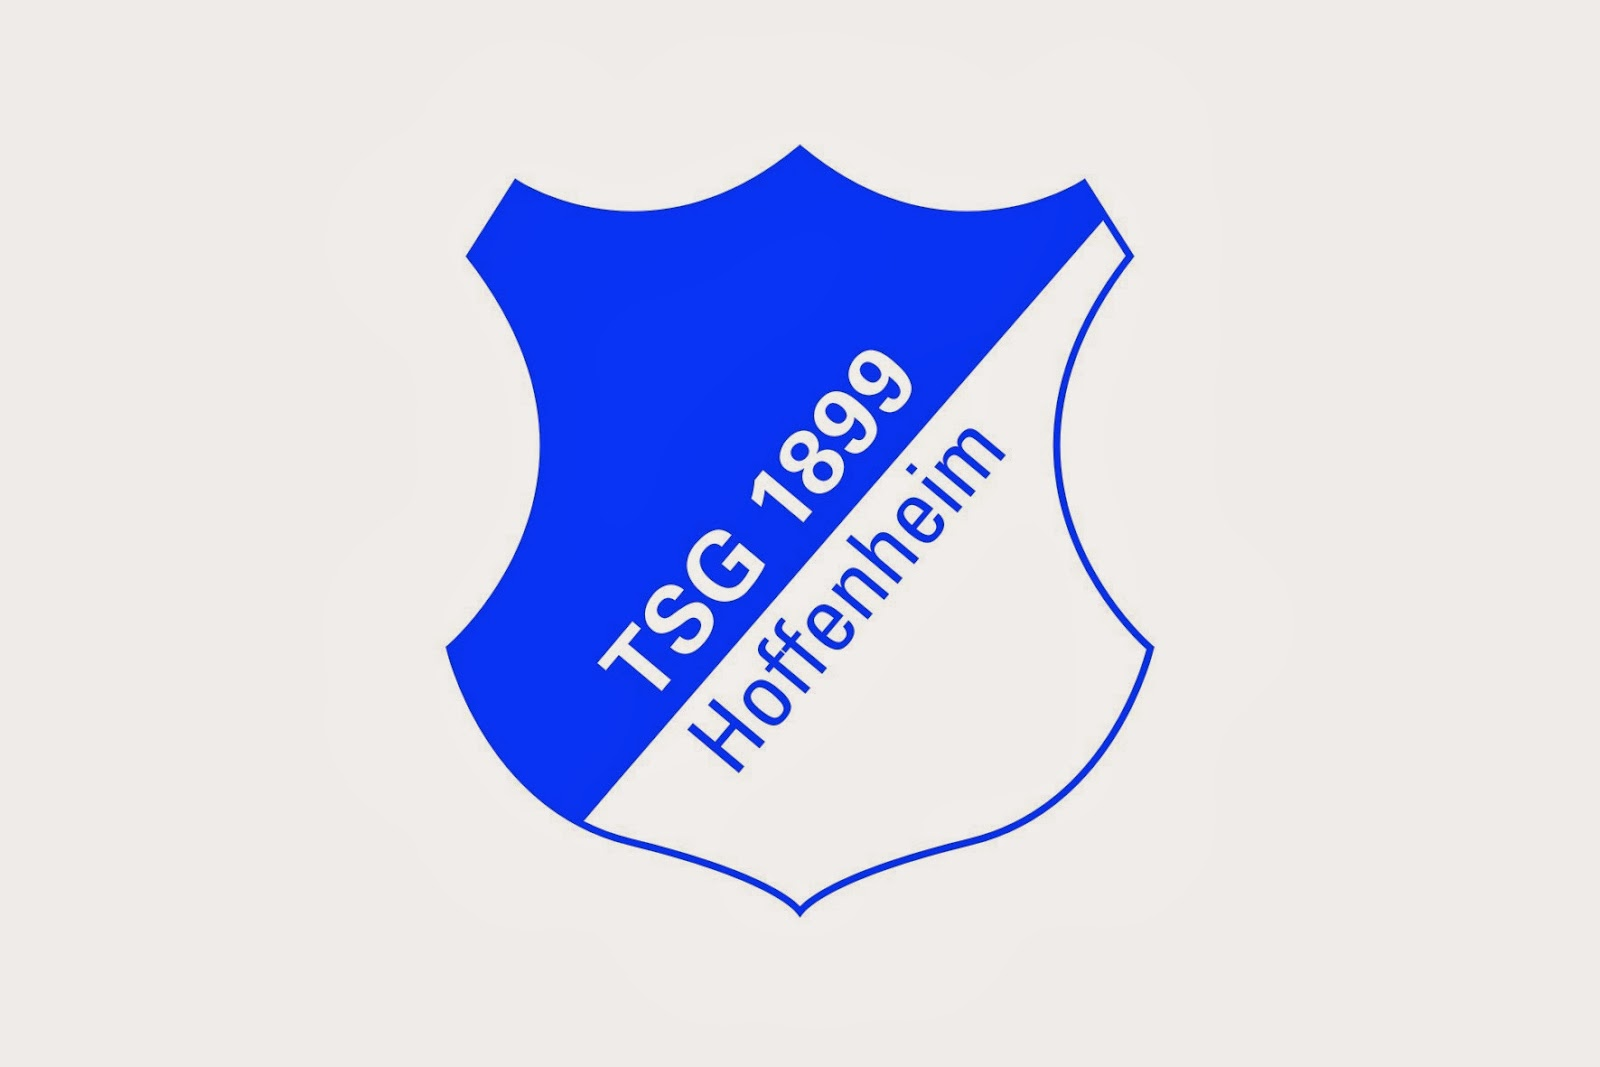 tsg 1899 hoffenheim logo logo share. Black Bedroom Furniture Sets. Home Design Ideas